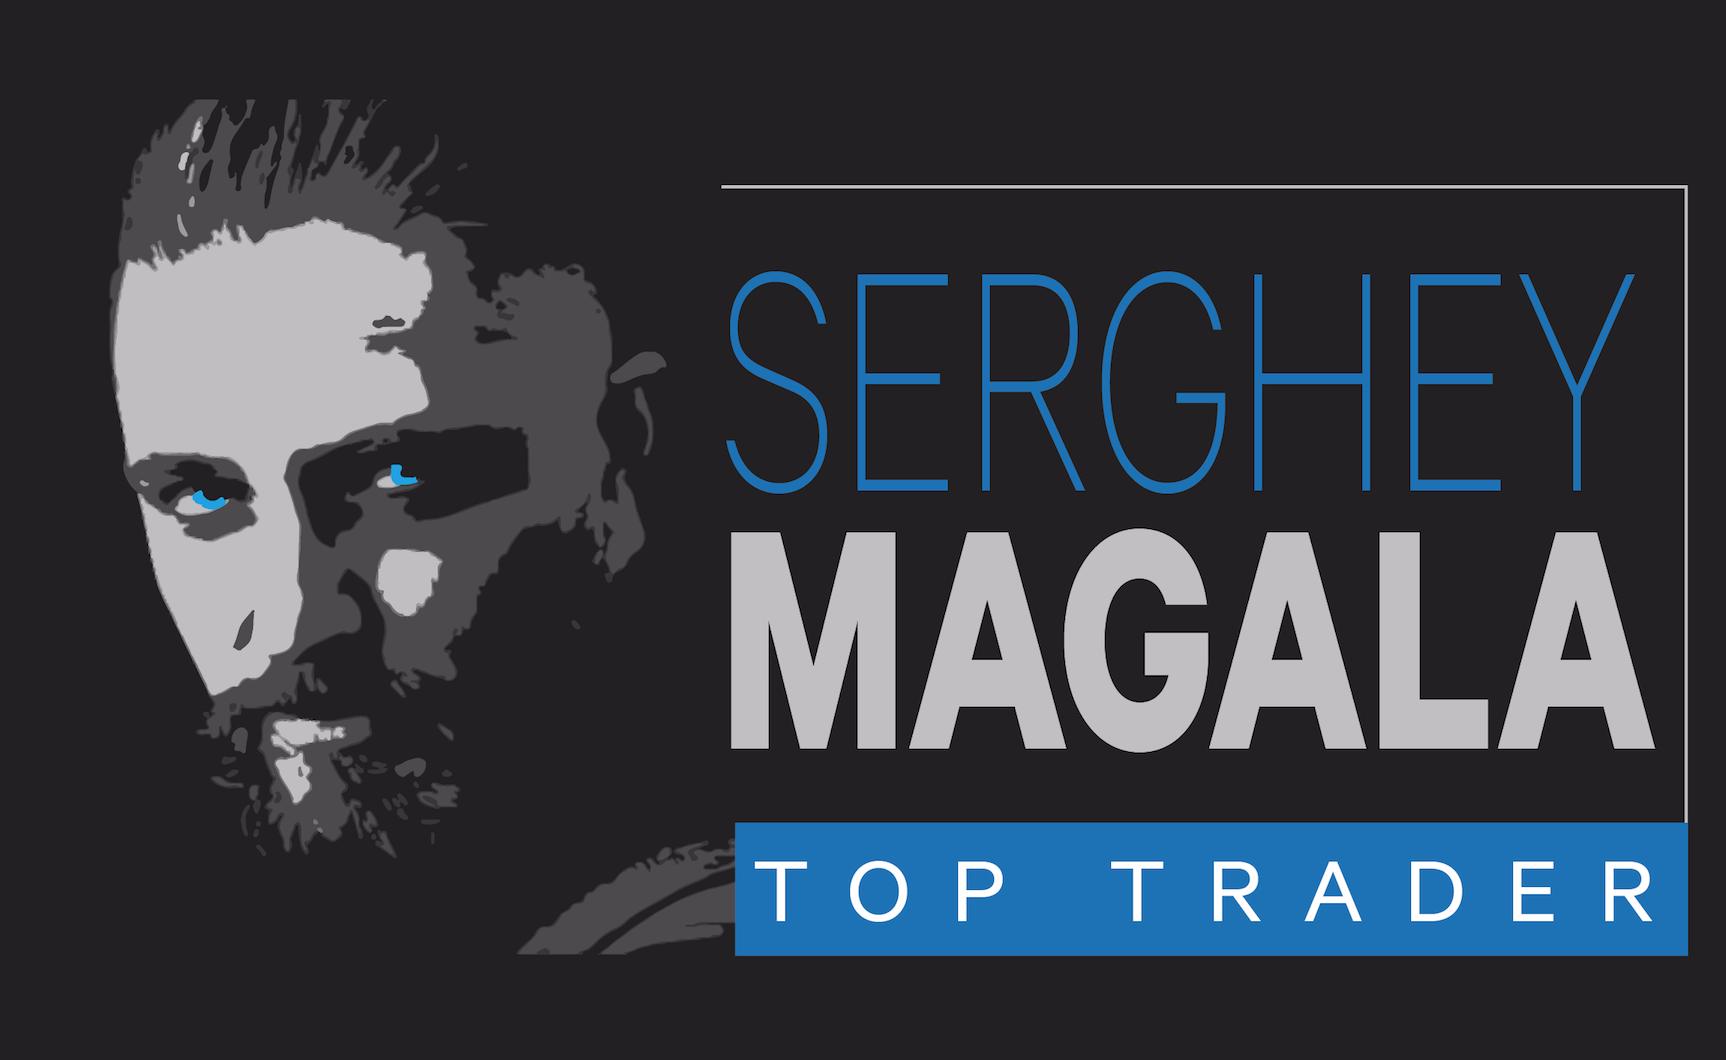 Serghey Magala